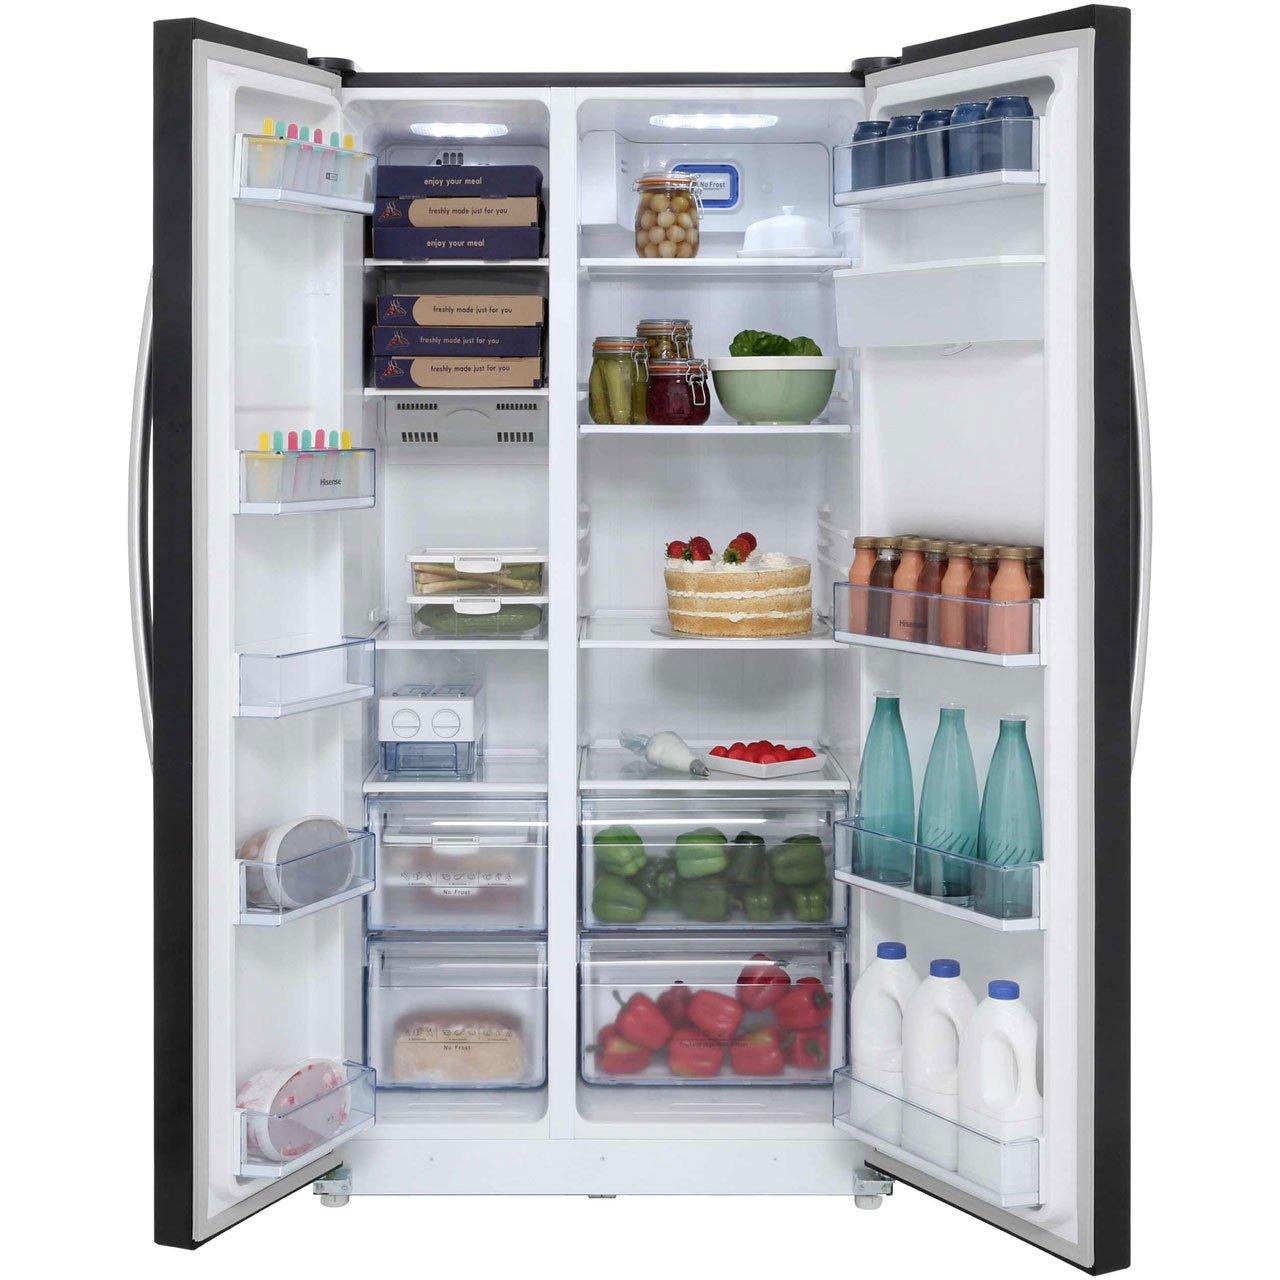 Fridges & Freezers Rental Goods